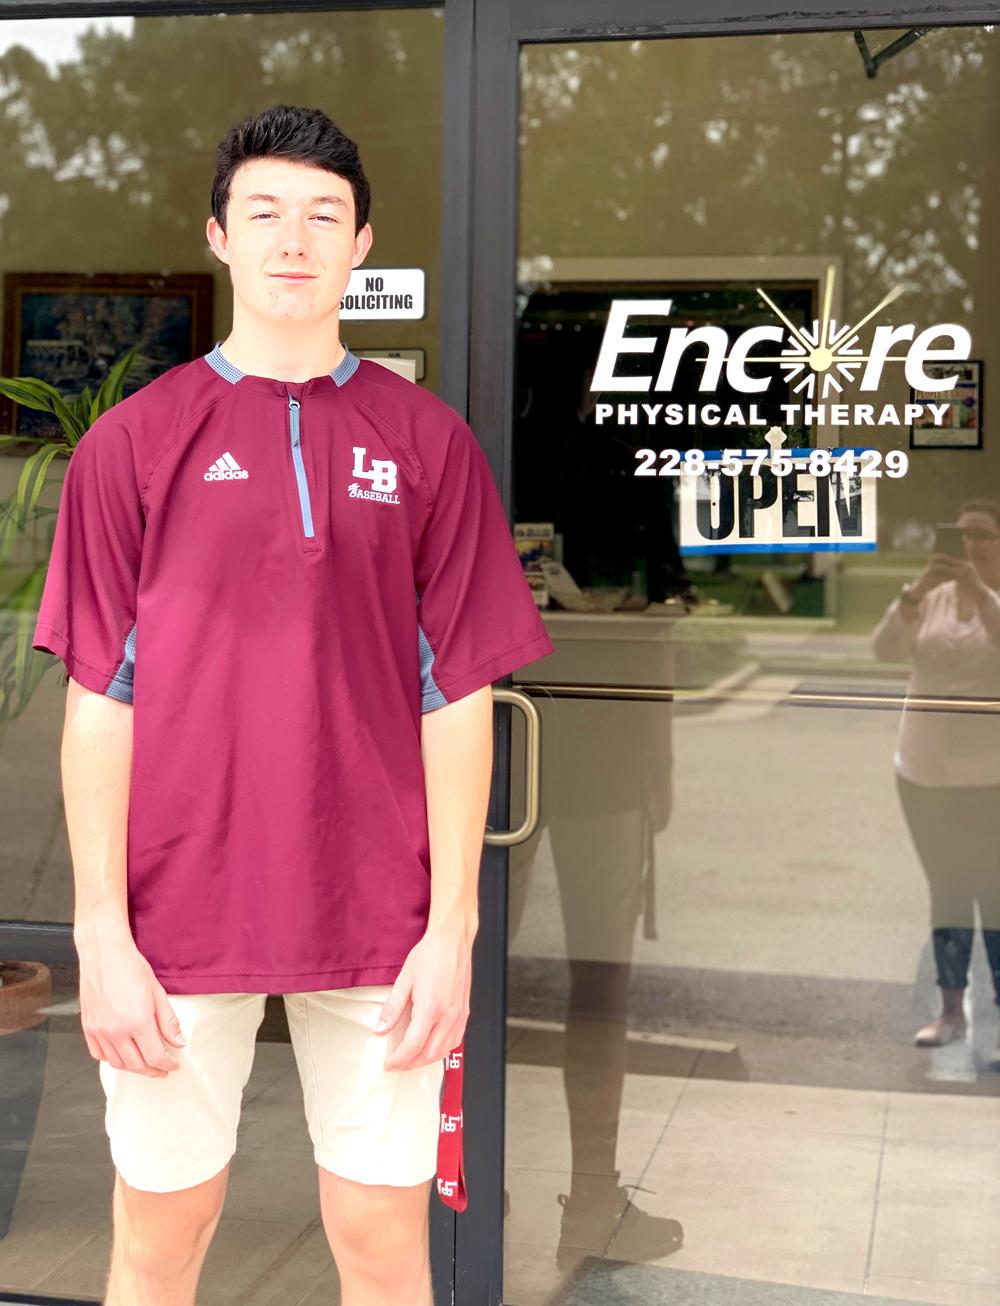 Kyle Parks is Athlete of the Month for Encore Rehabilitation-Long Beach #EncoreRehab